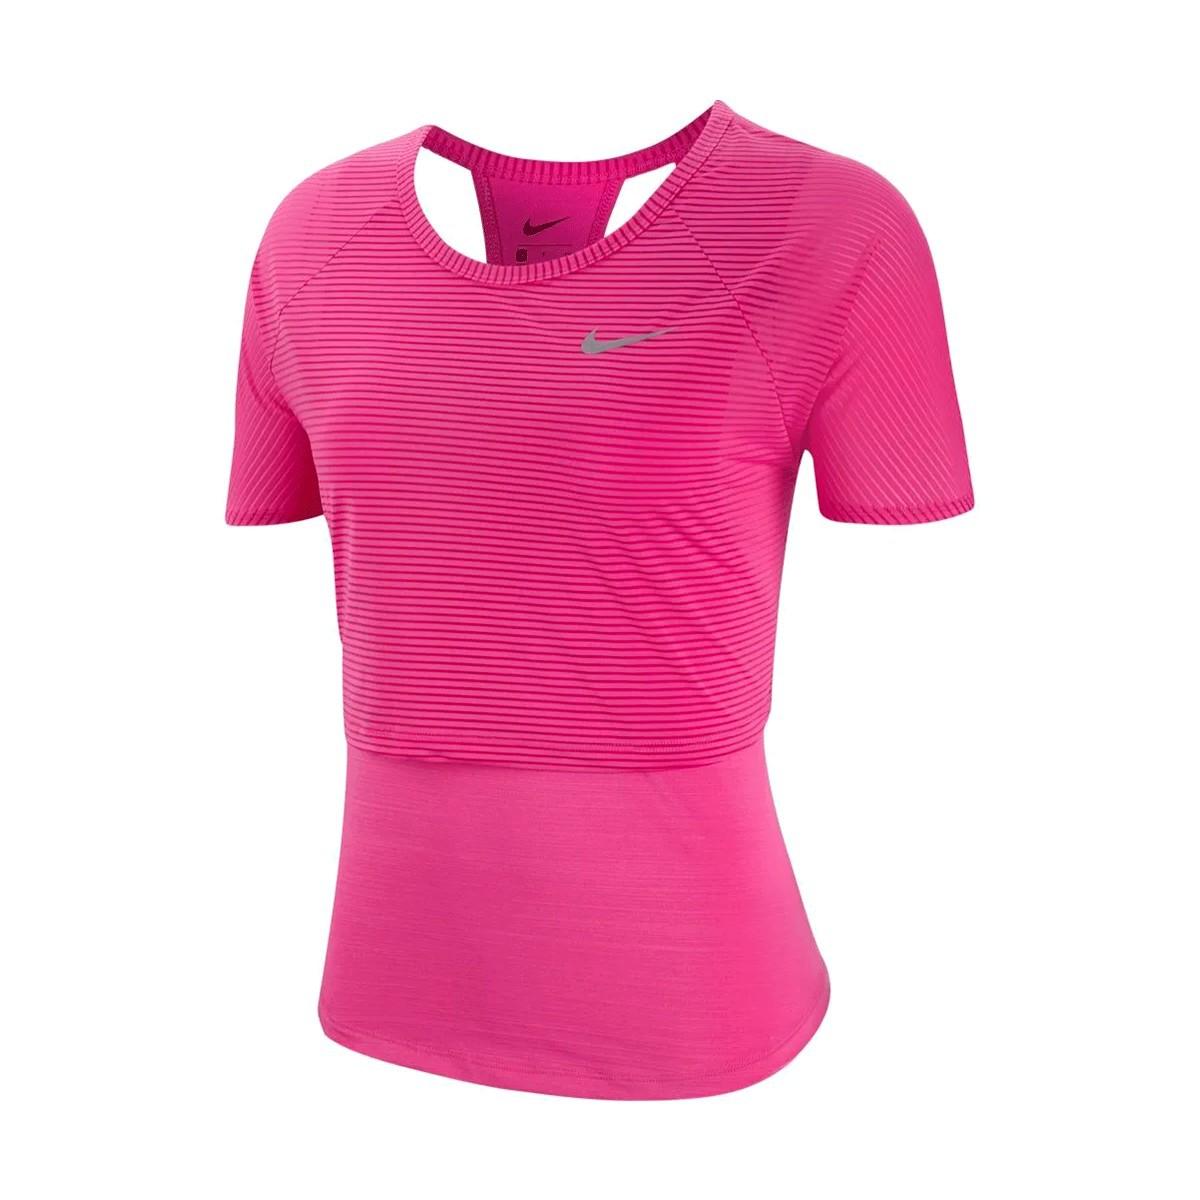 Camiseta Nike Top SS Feminina Rosa